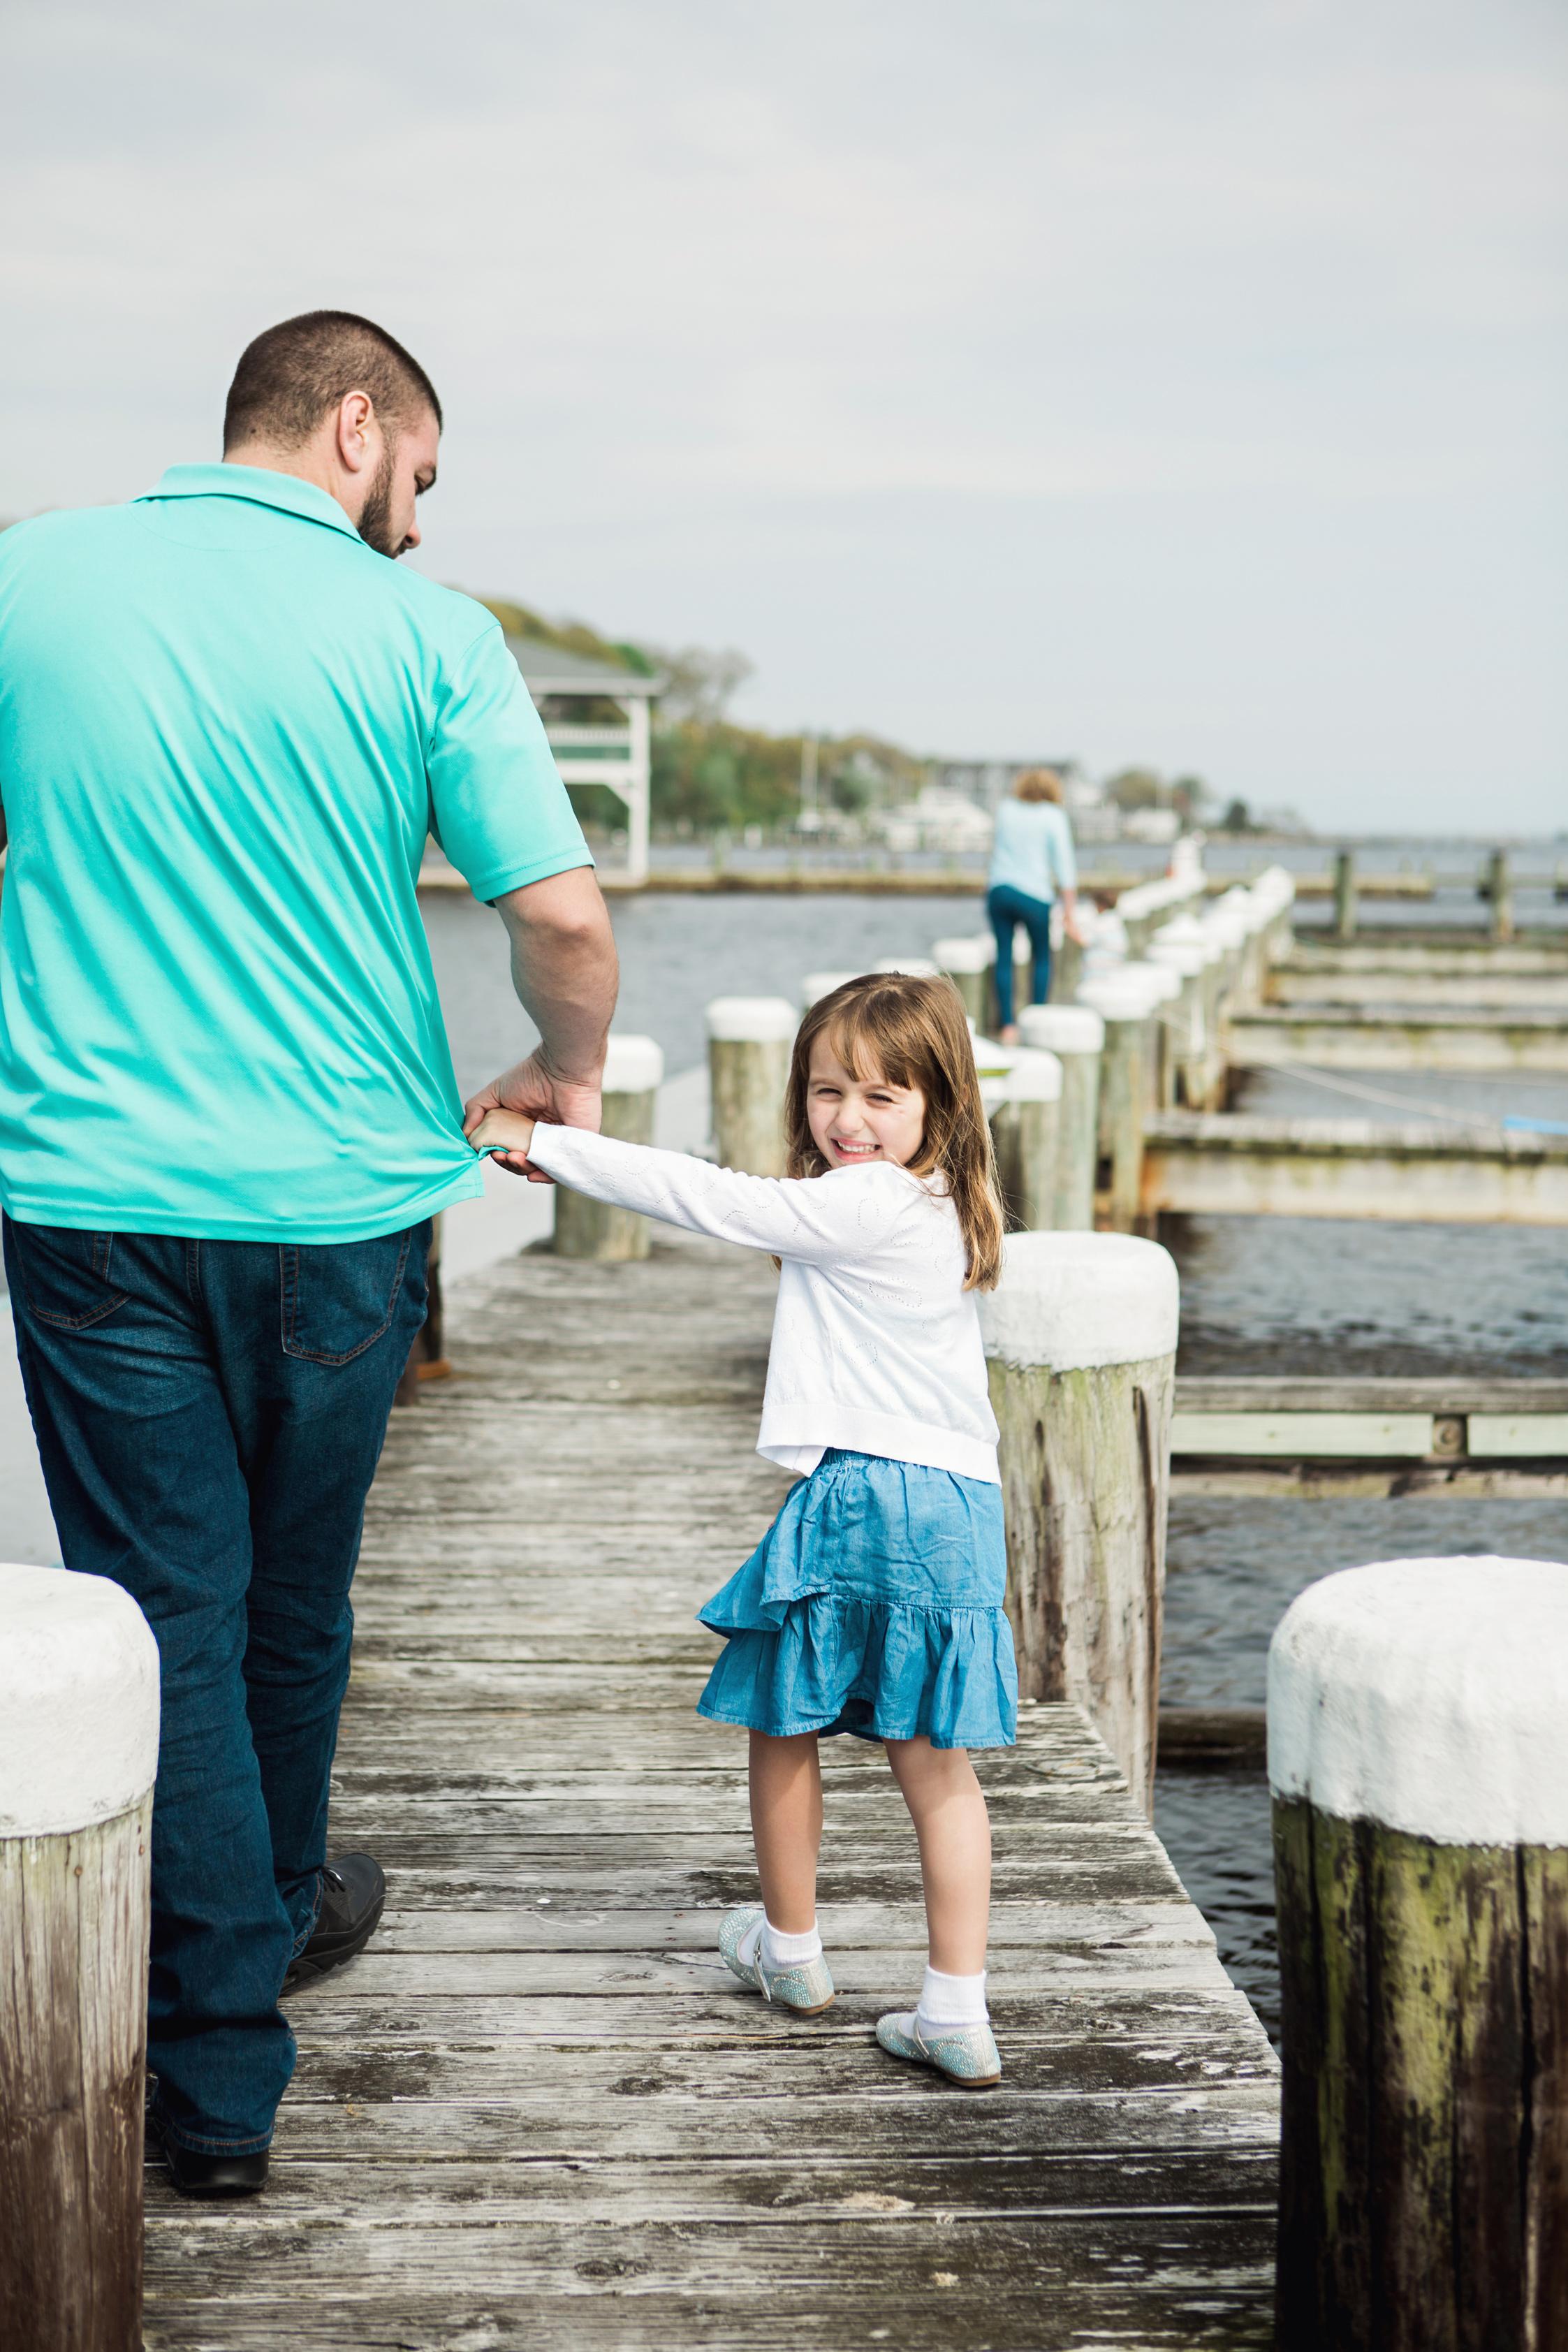 CindyGiovagnoliPhotography_Seattle_Washington_PNW_Family_Childrens_Portraits_Photography-004.jpg